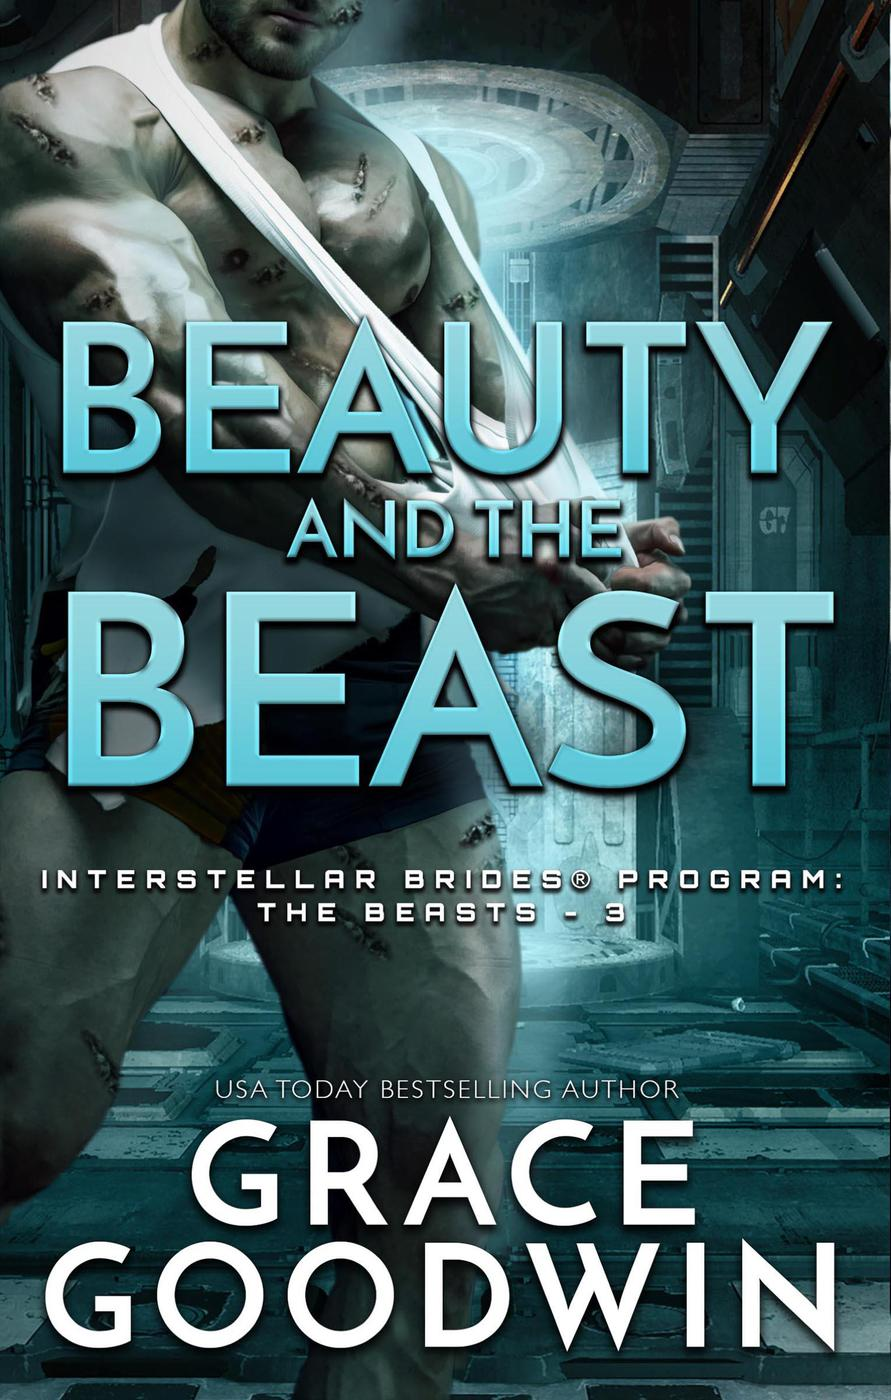 Beauty and the Beast (Interstellar Brides® Program: The Beasts, #3)